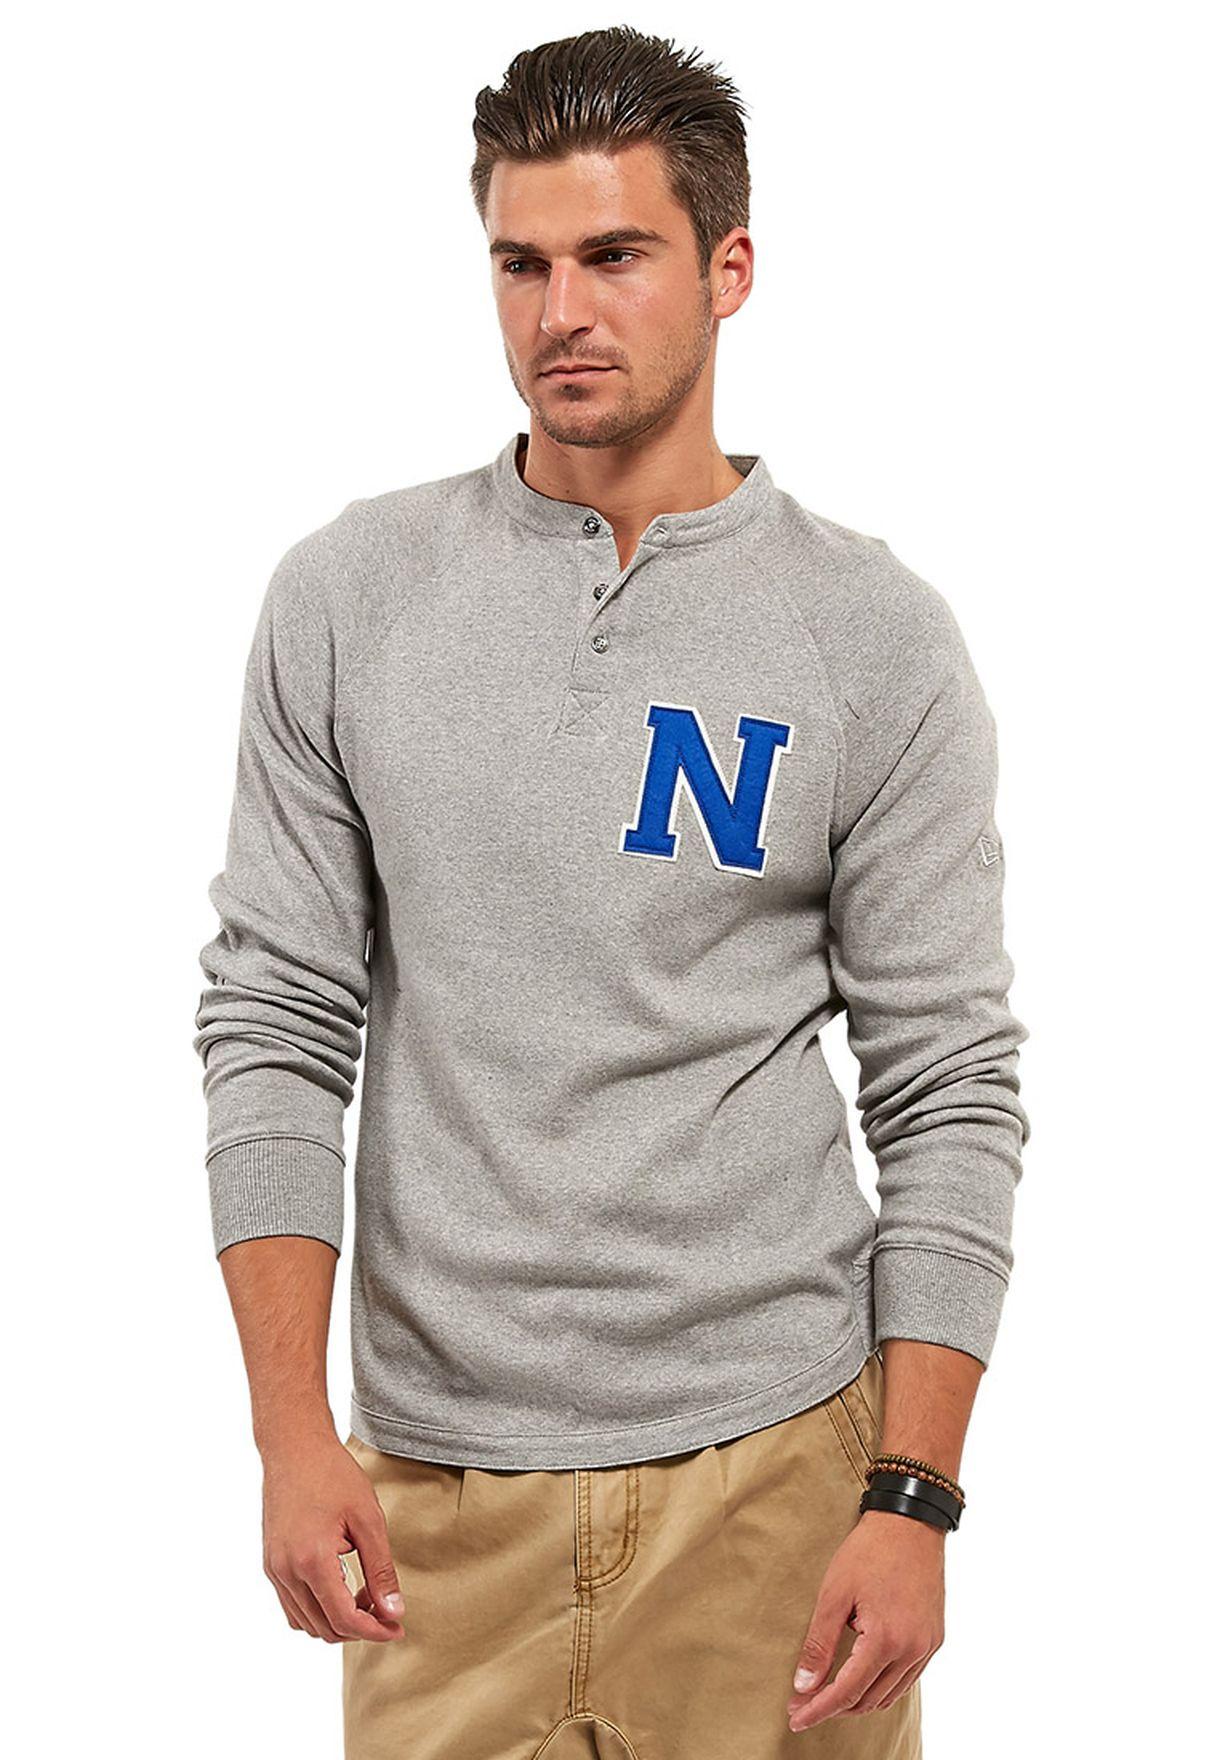 4d6a7f72 Shop New Era grey Varsity T-shirt for Men in Qatar - NE207AT98URL